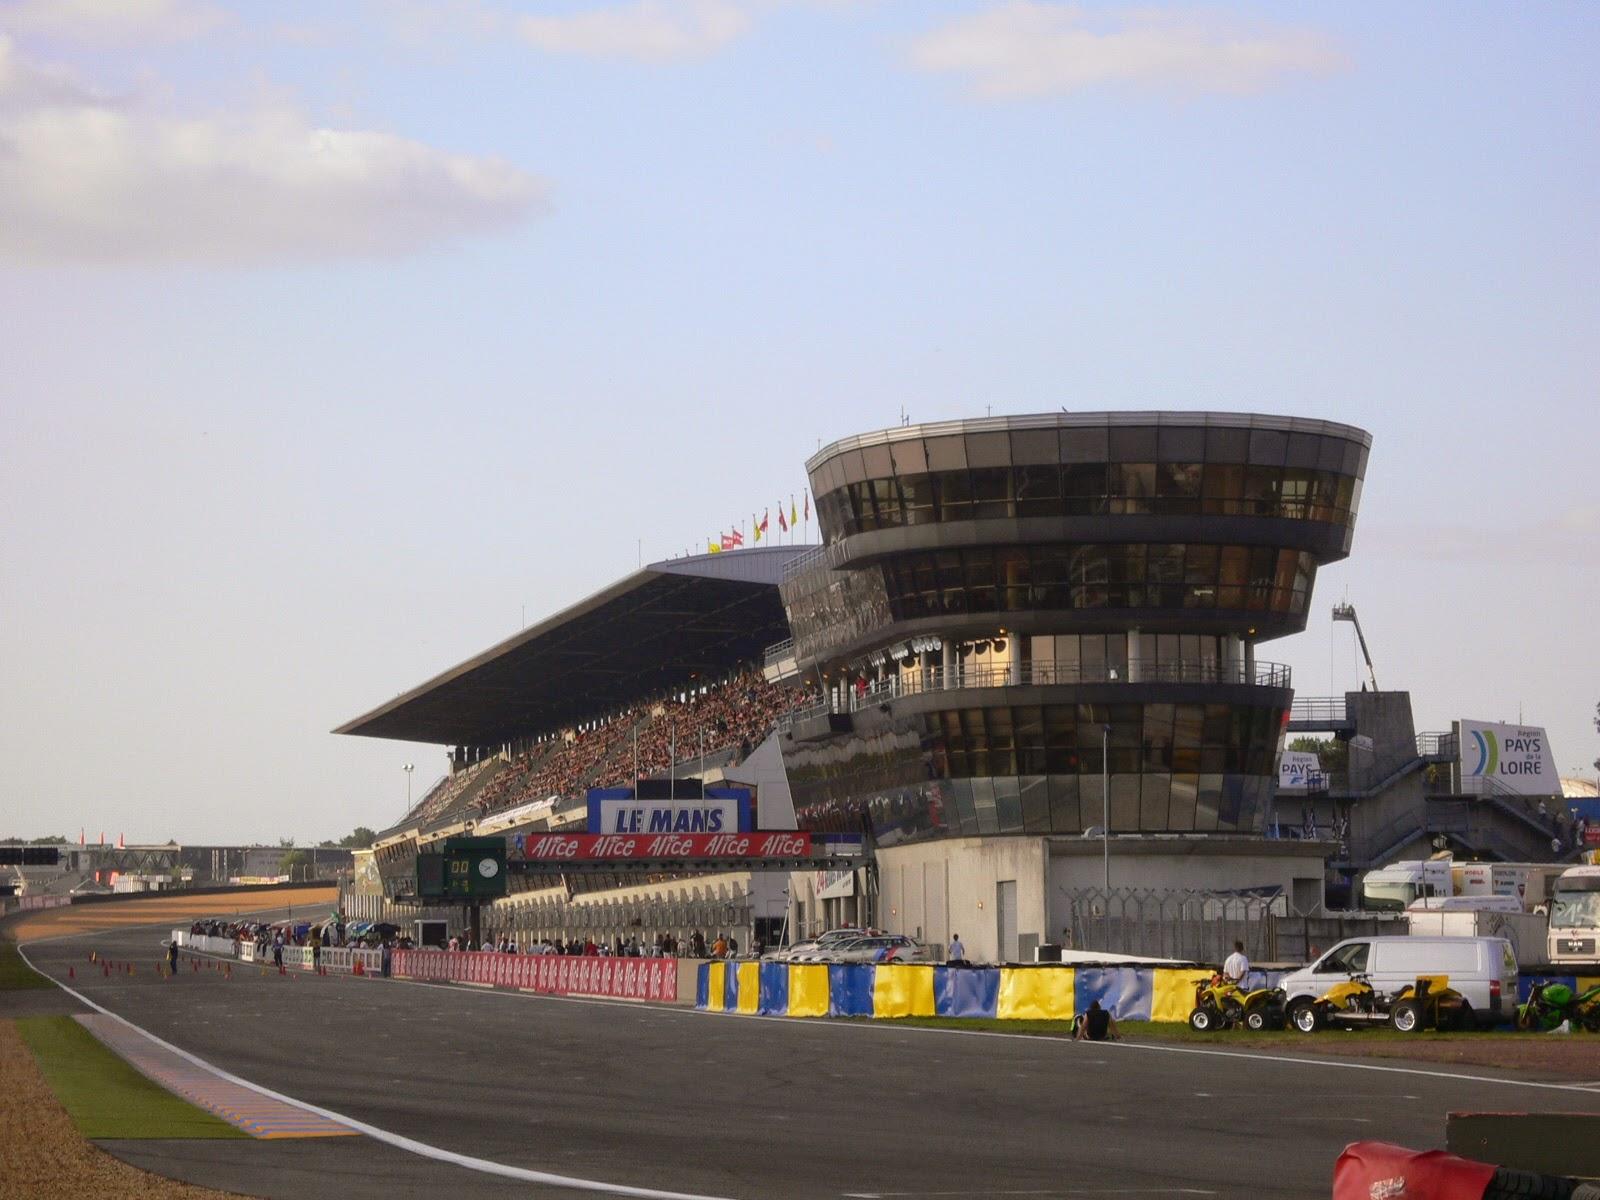 Torre circuito de Le Mans